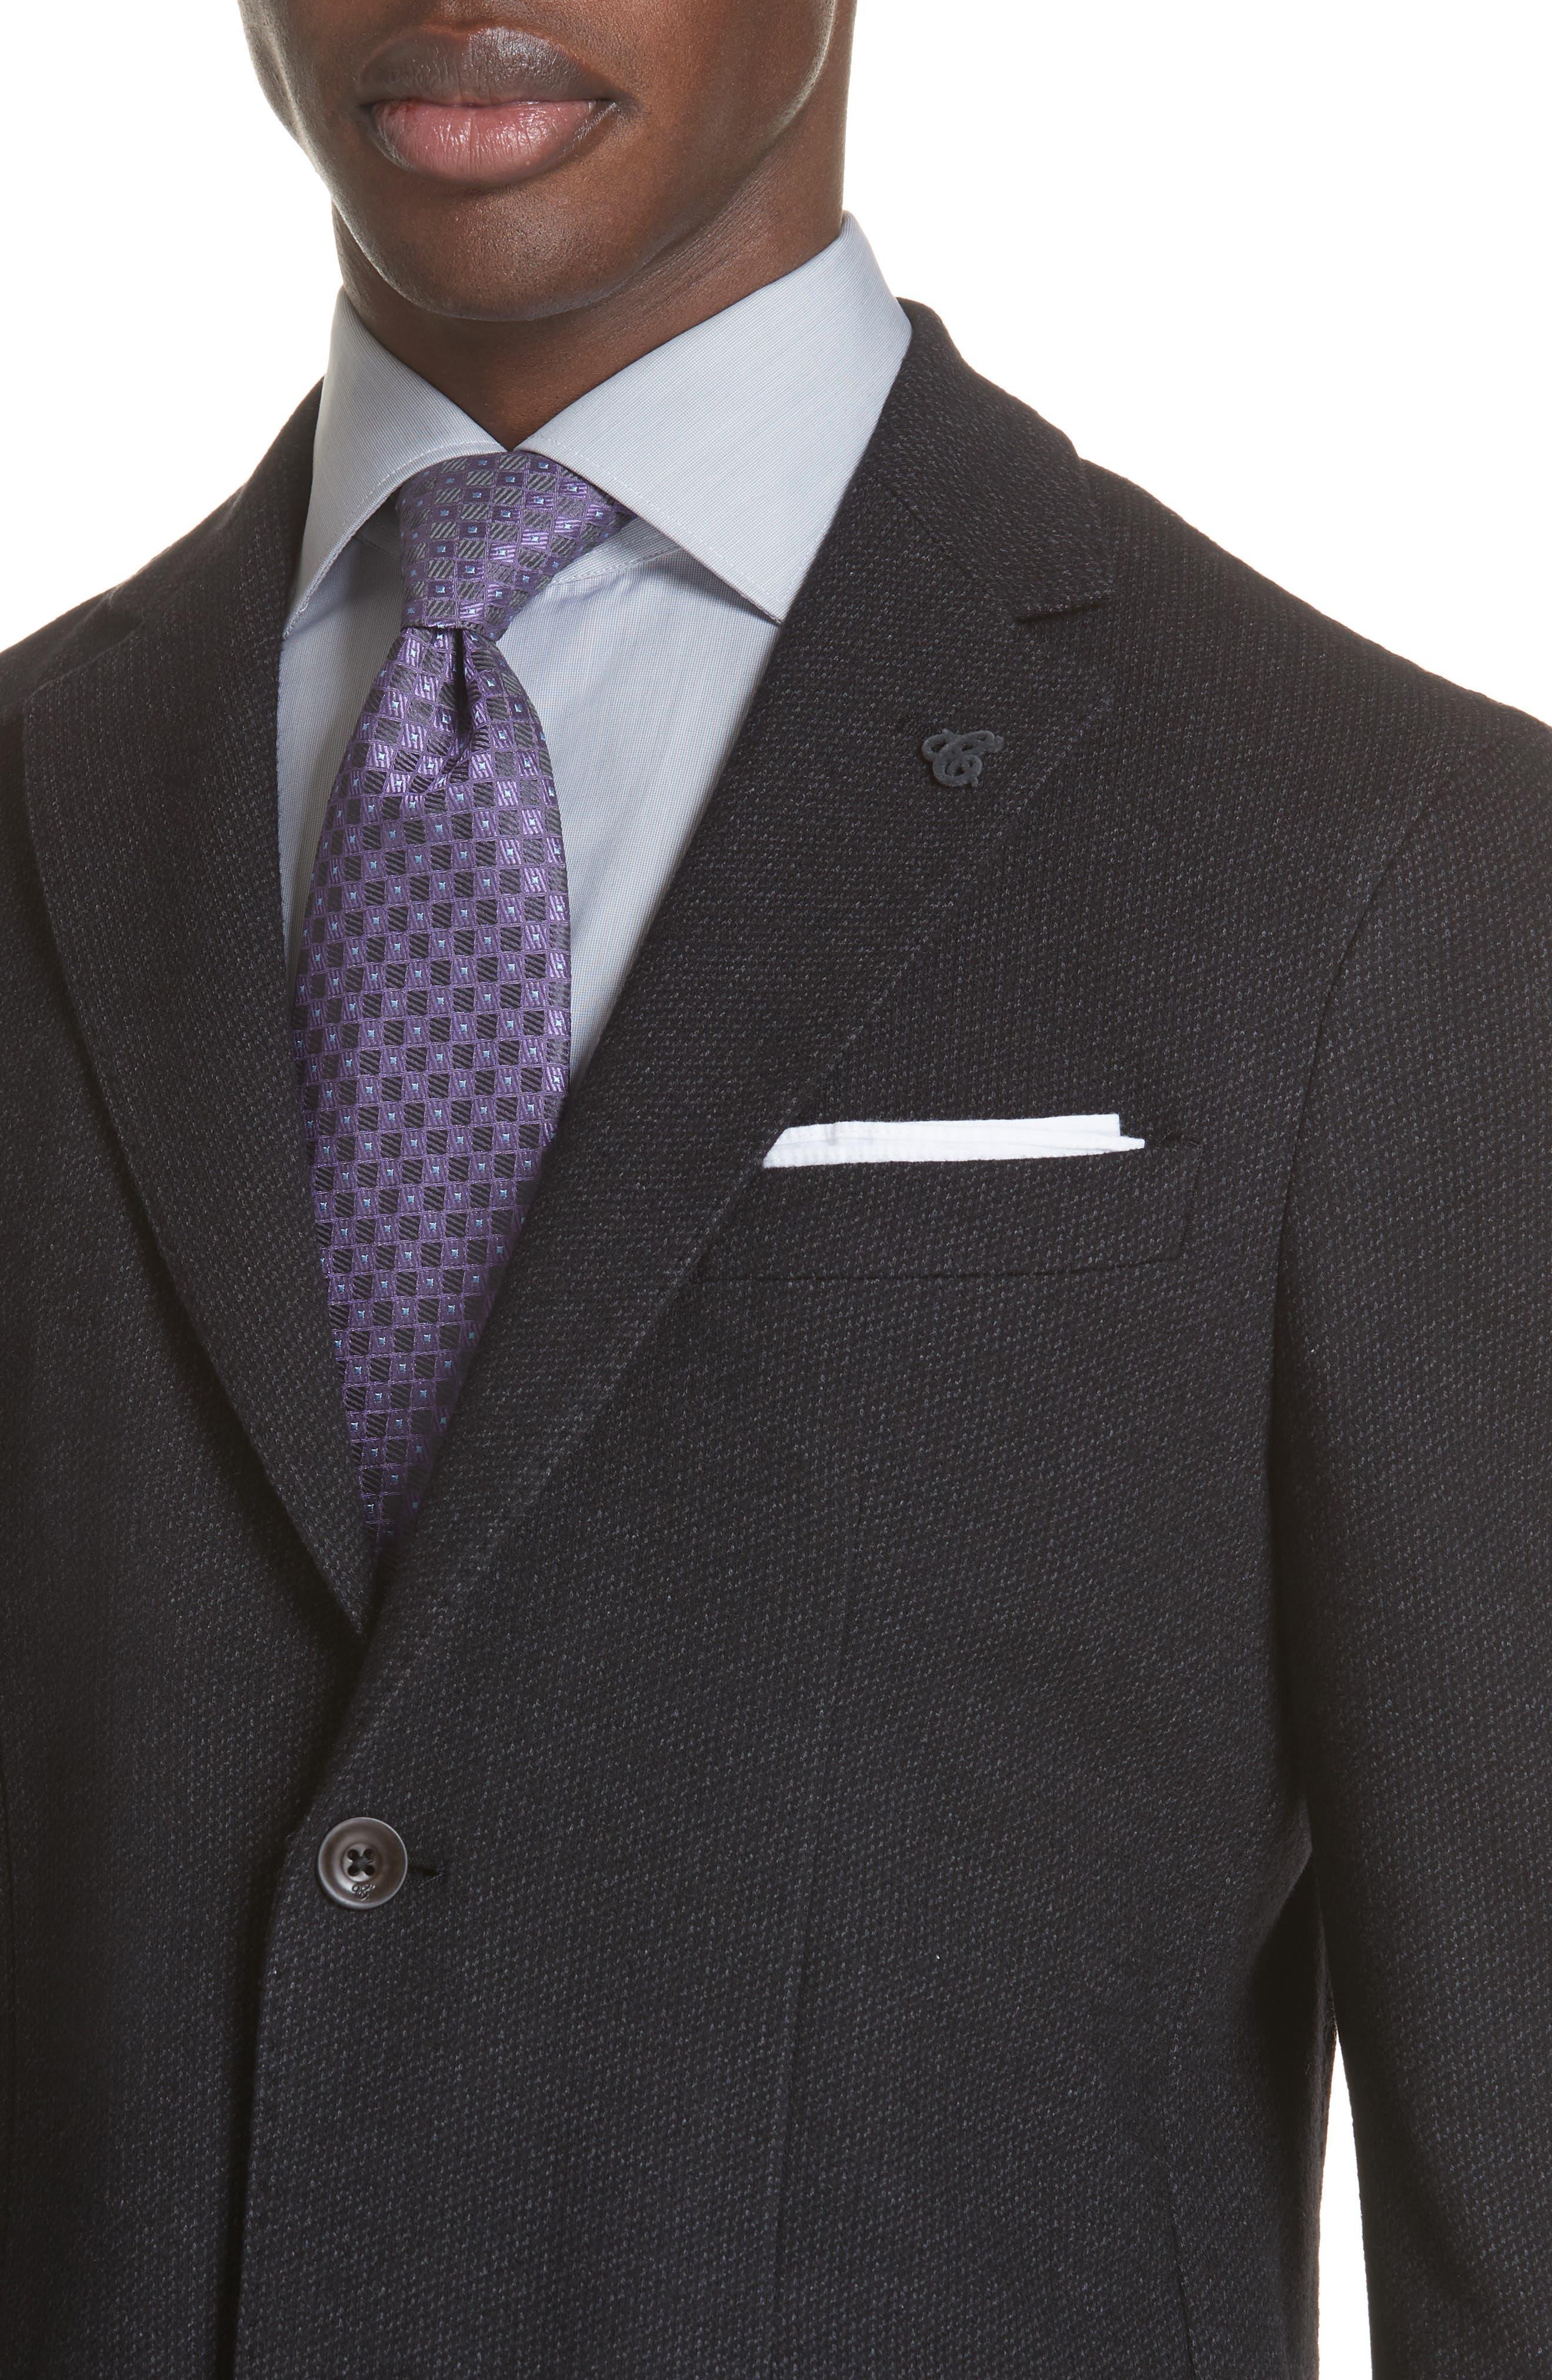 Slim Fit Wool & Cotton Blazer,                             Alternate thumbnail 4, color,                             Grey